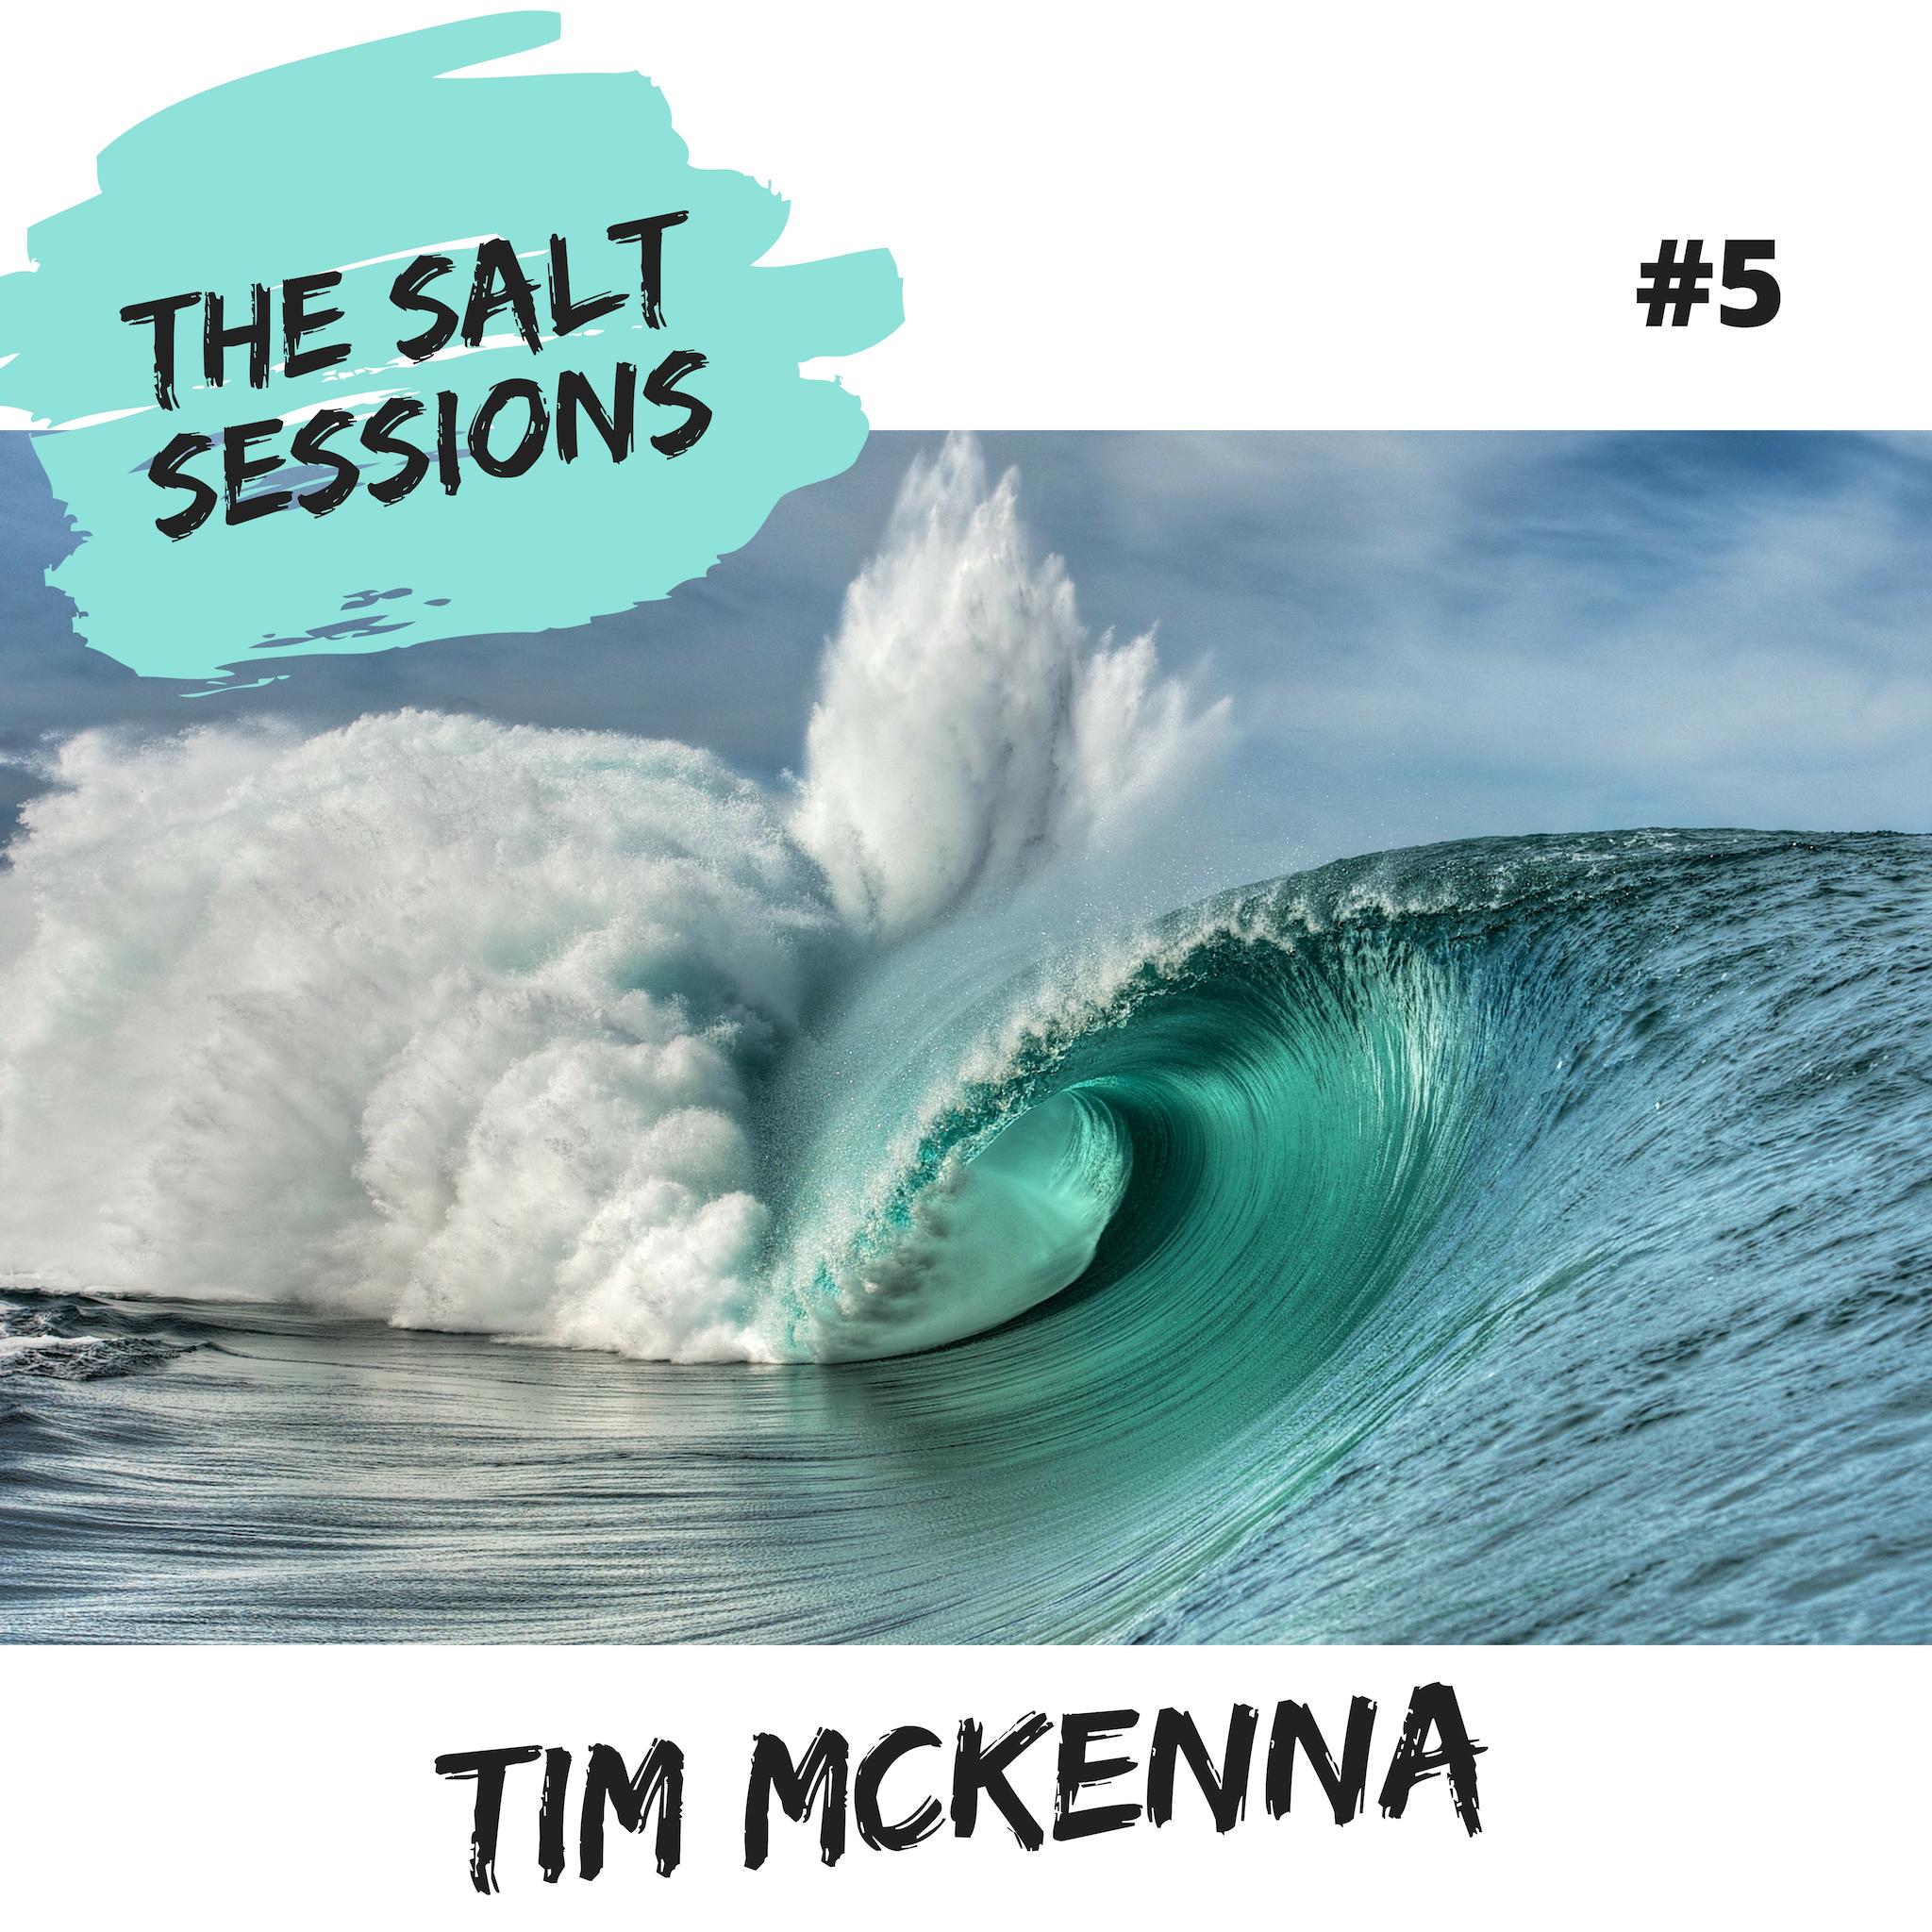 TIM_MCKENNA_IG_POST.jpg